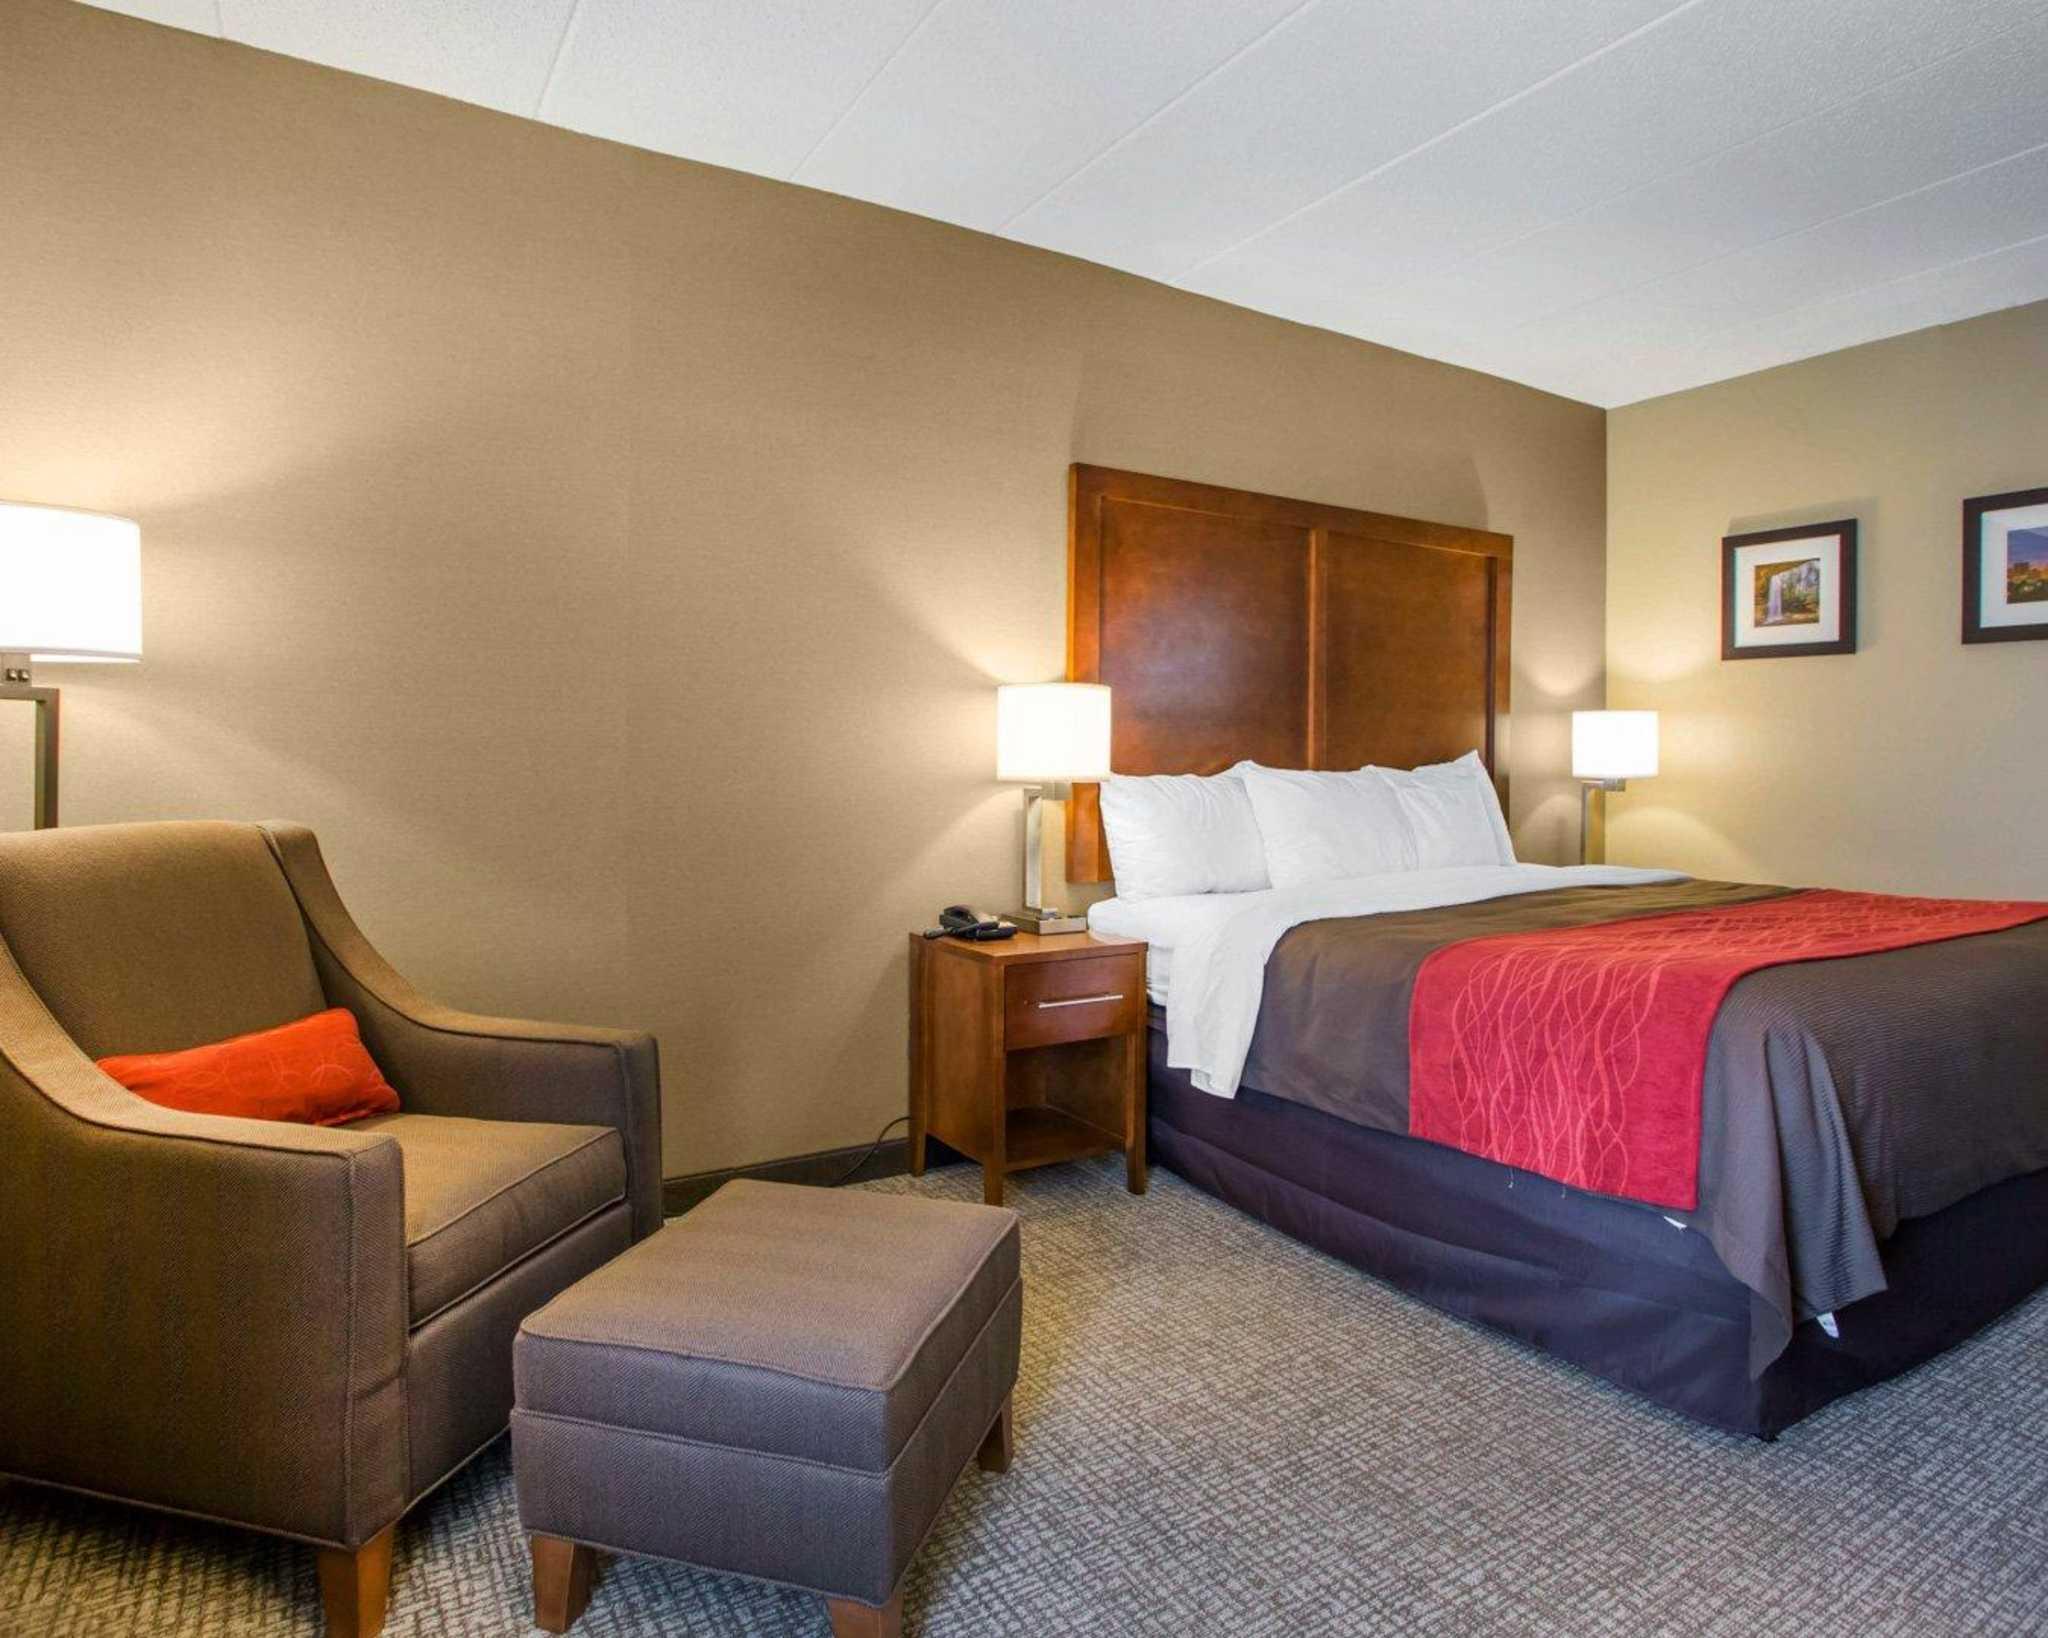 Comfort Inn Dayton - Huber Heights image 9